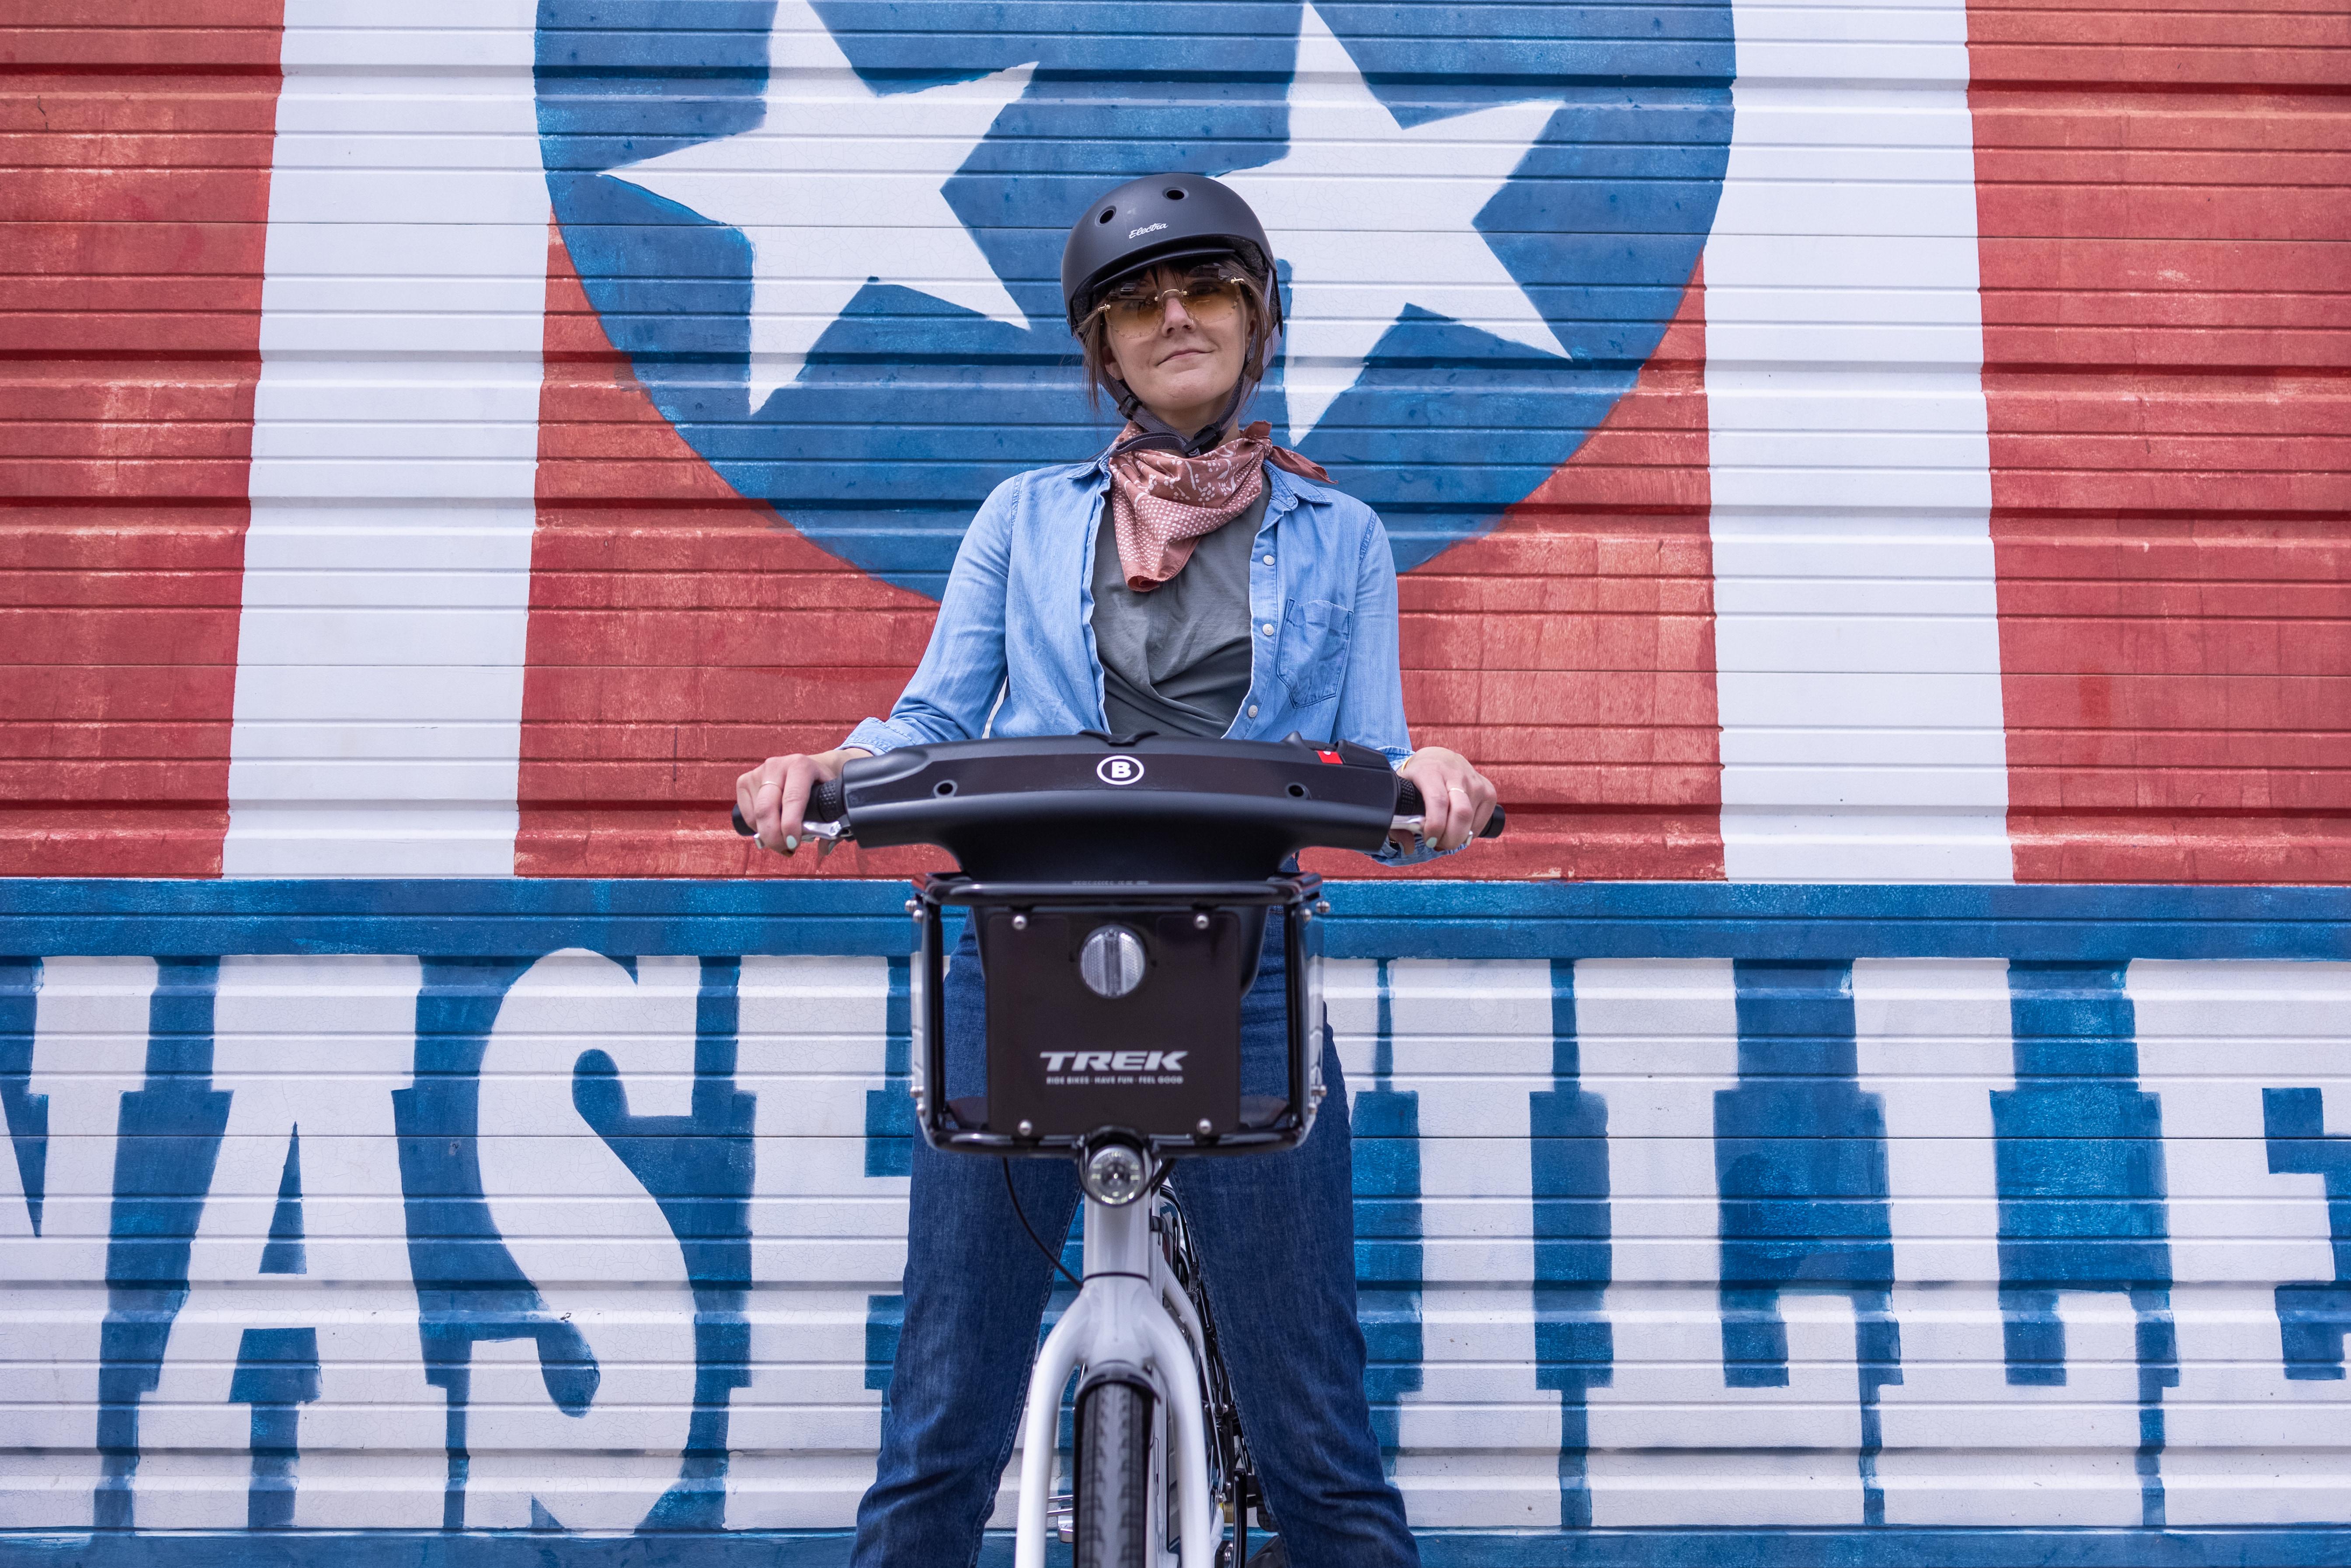 NashvilleBCycleisBack